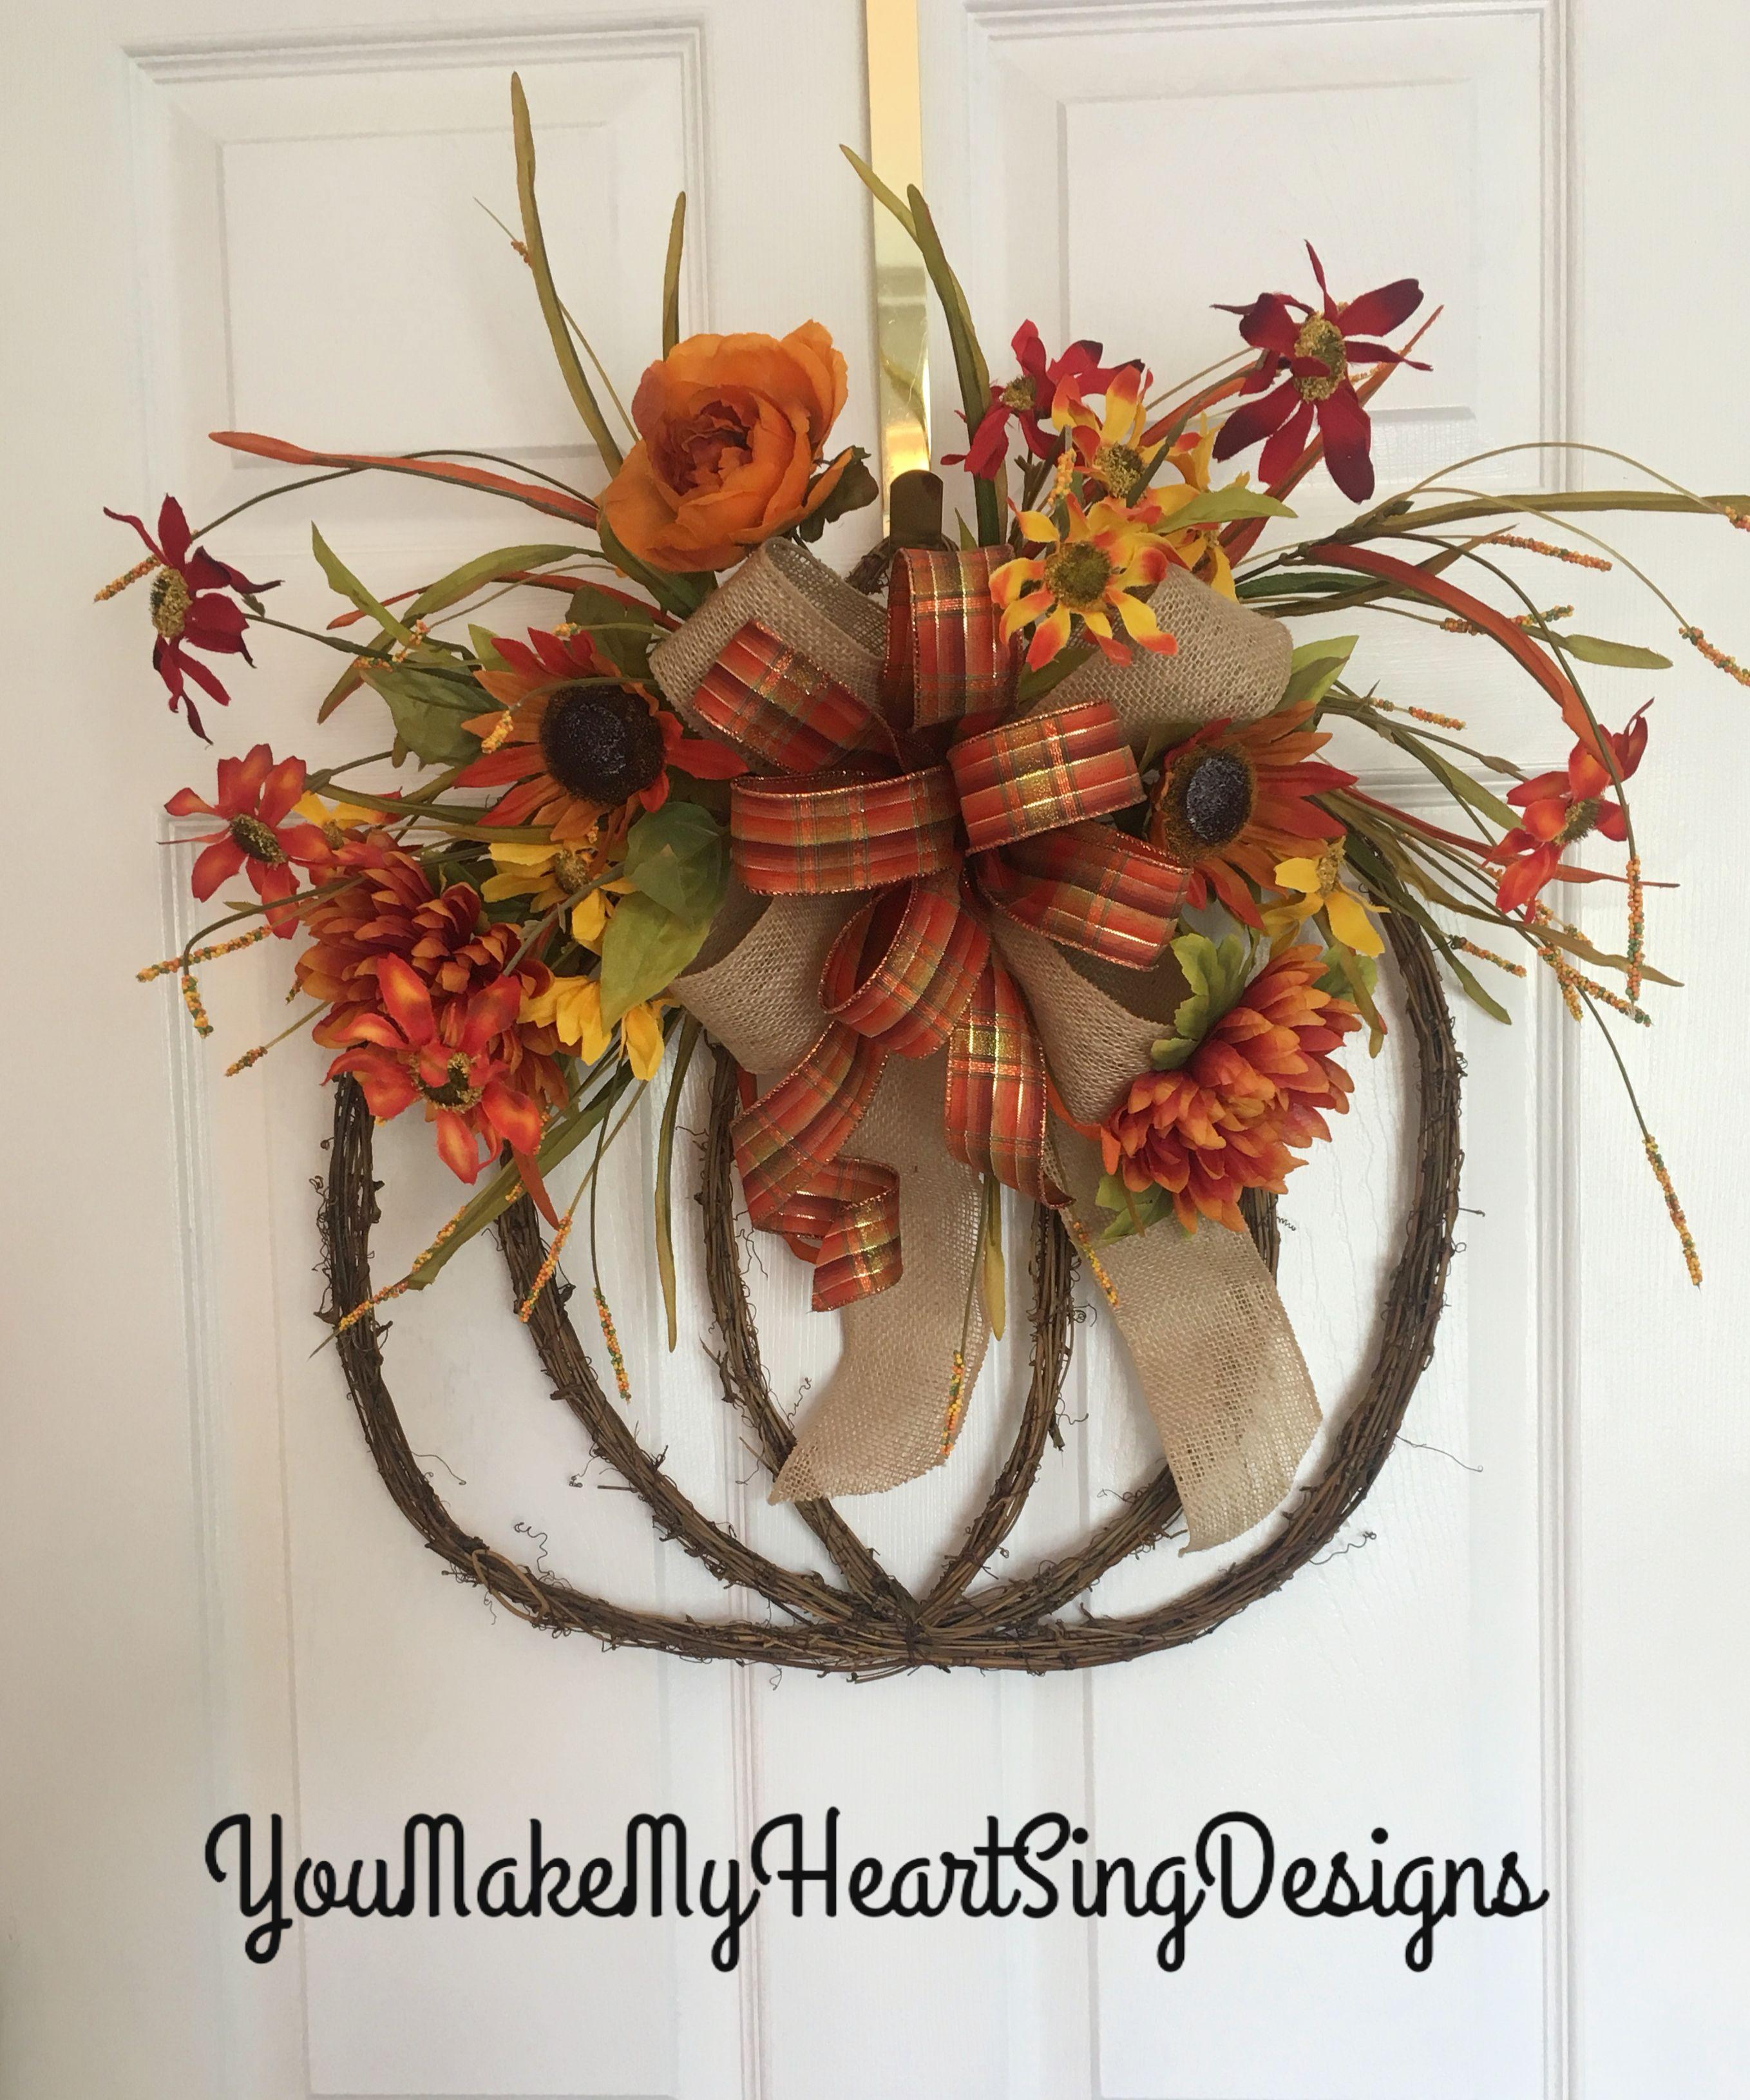 Pumpkin Grapevine Wreath Fall Pumpkin Wreath Fall Wreath Pumpkin And Fall Floral Wreath Fall Grapevine Wreaths Diy Grapevine Wreath Fall Wreath